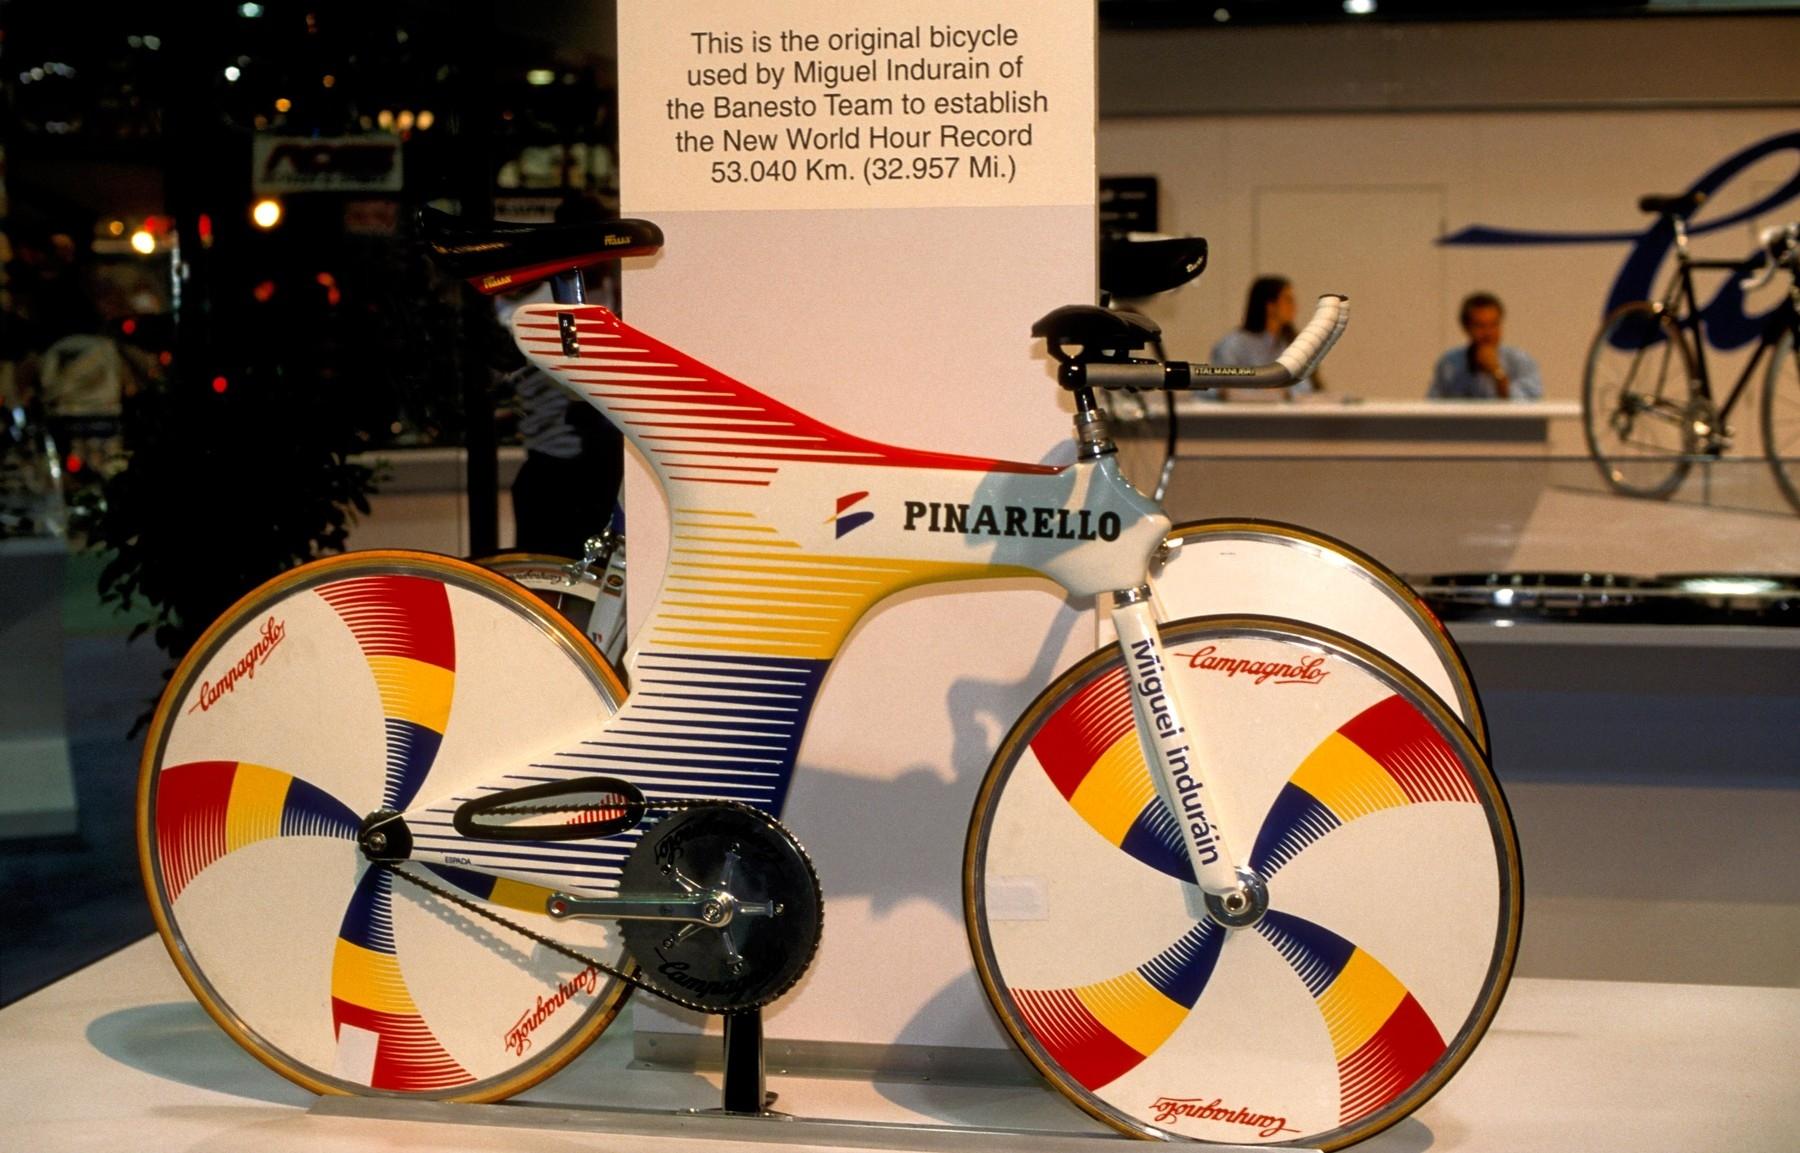 Speciál, na němž v roce 1994 Miguel Indurain vytvořil rekord v hodinovce. Foto: profimedia